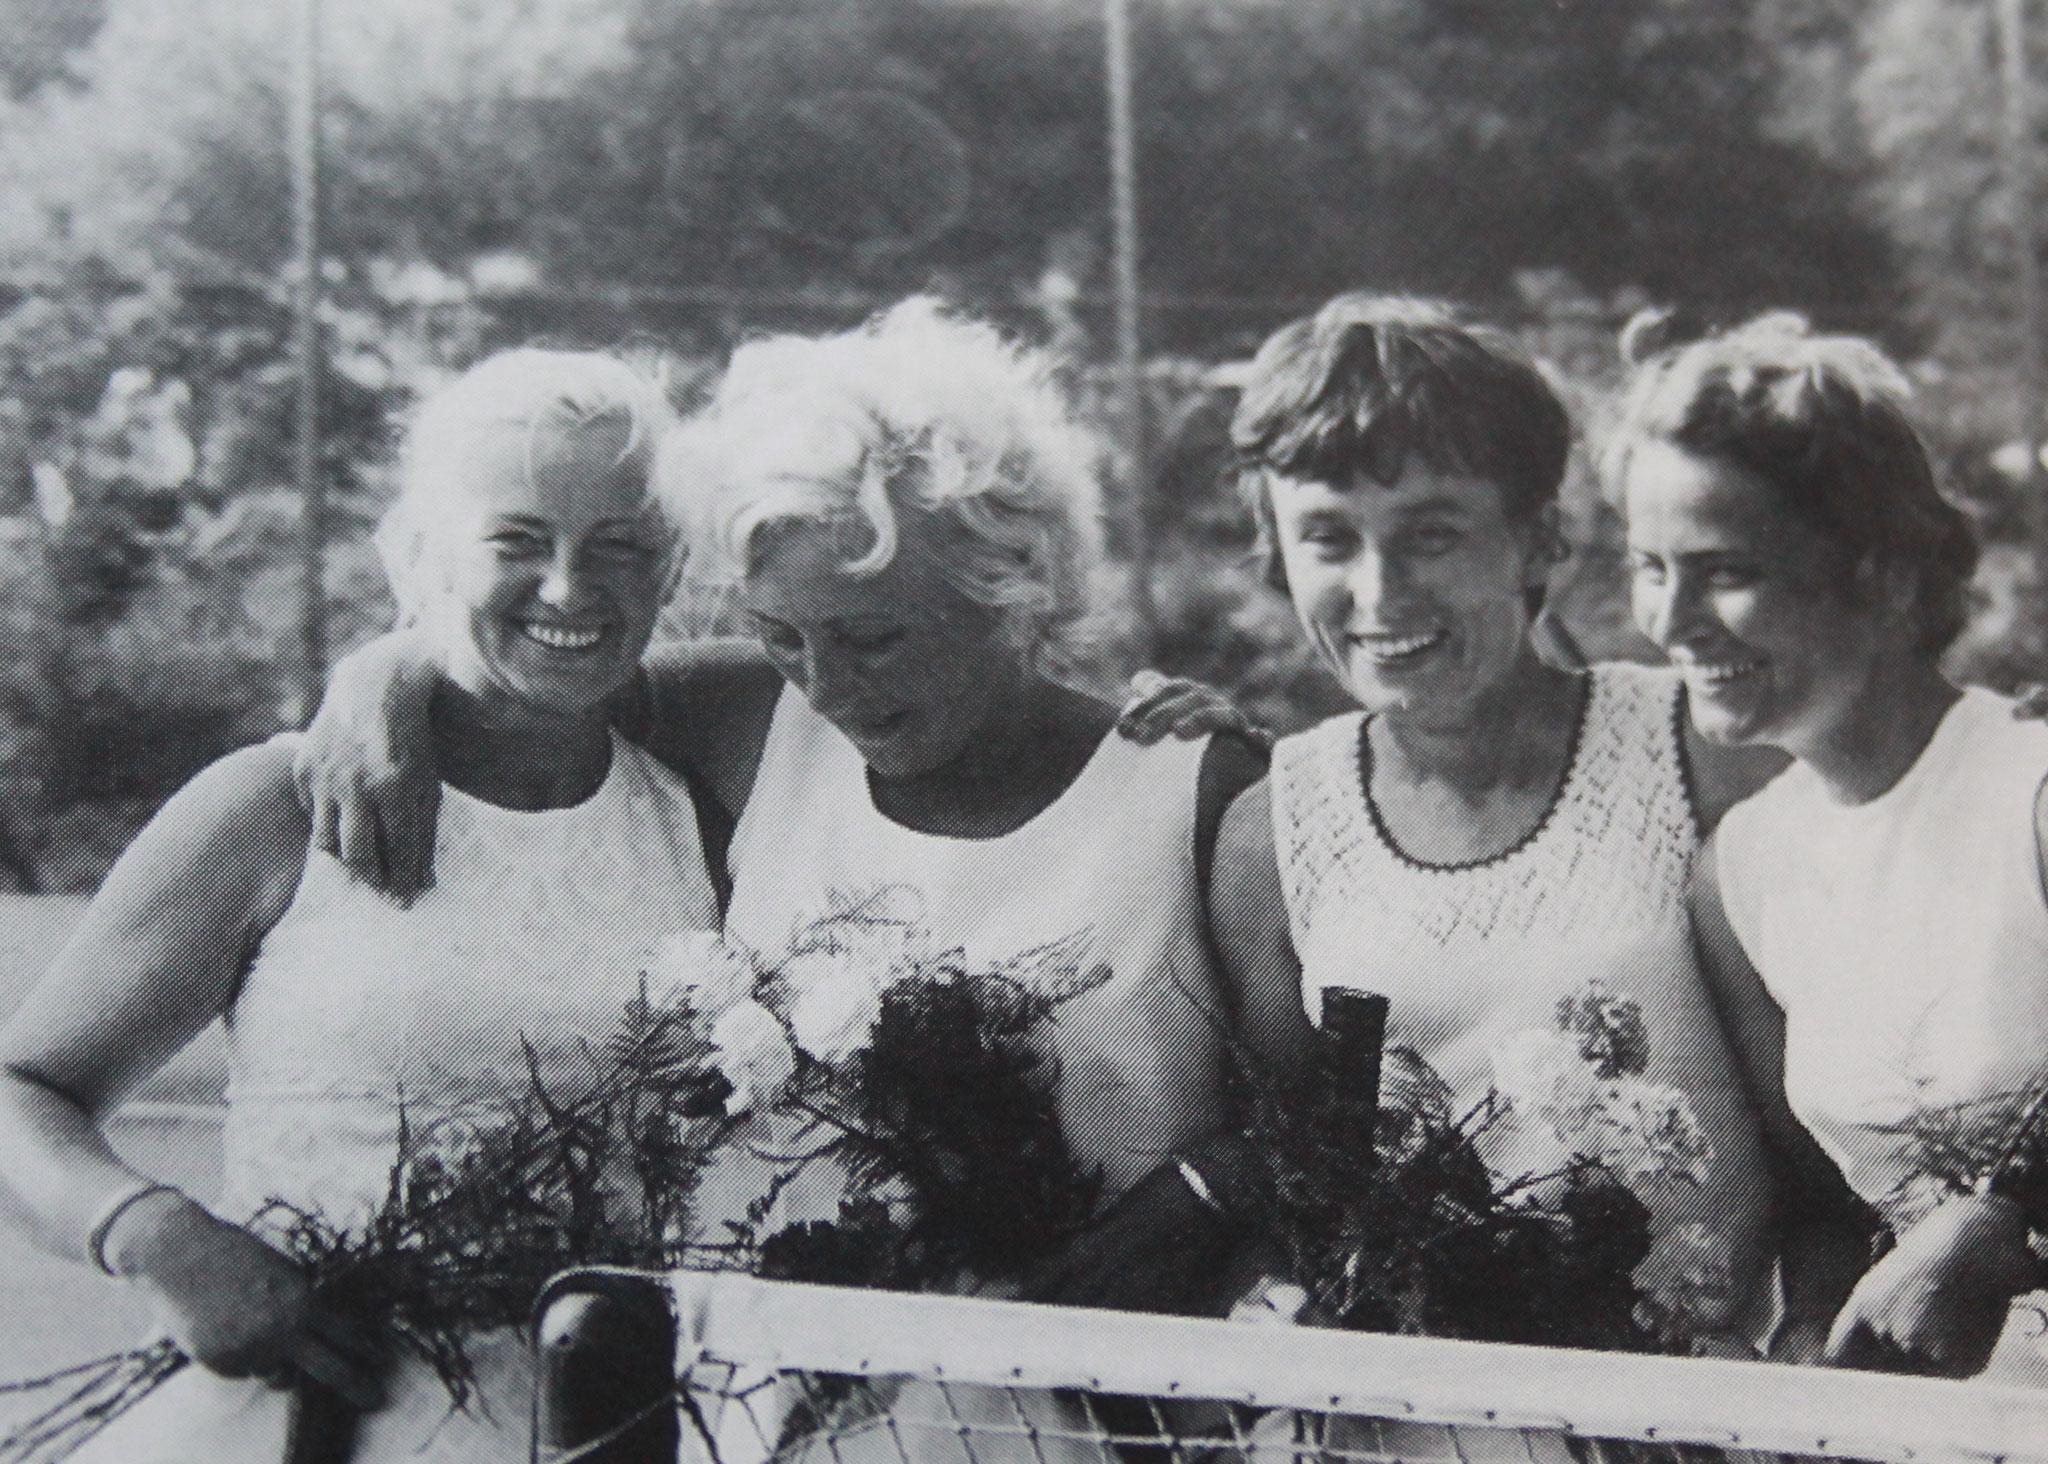 1977 Damen Landesliga Gruppe A. Frau Sack, Frau During (Preetz), Susi Reiberg und Karin Kasch